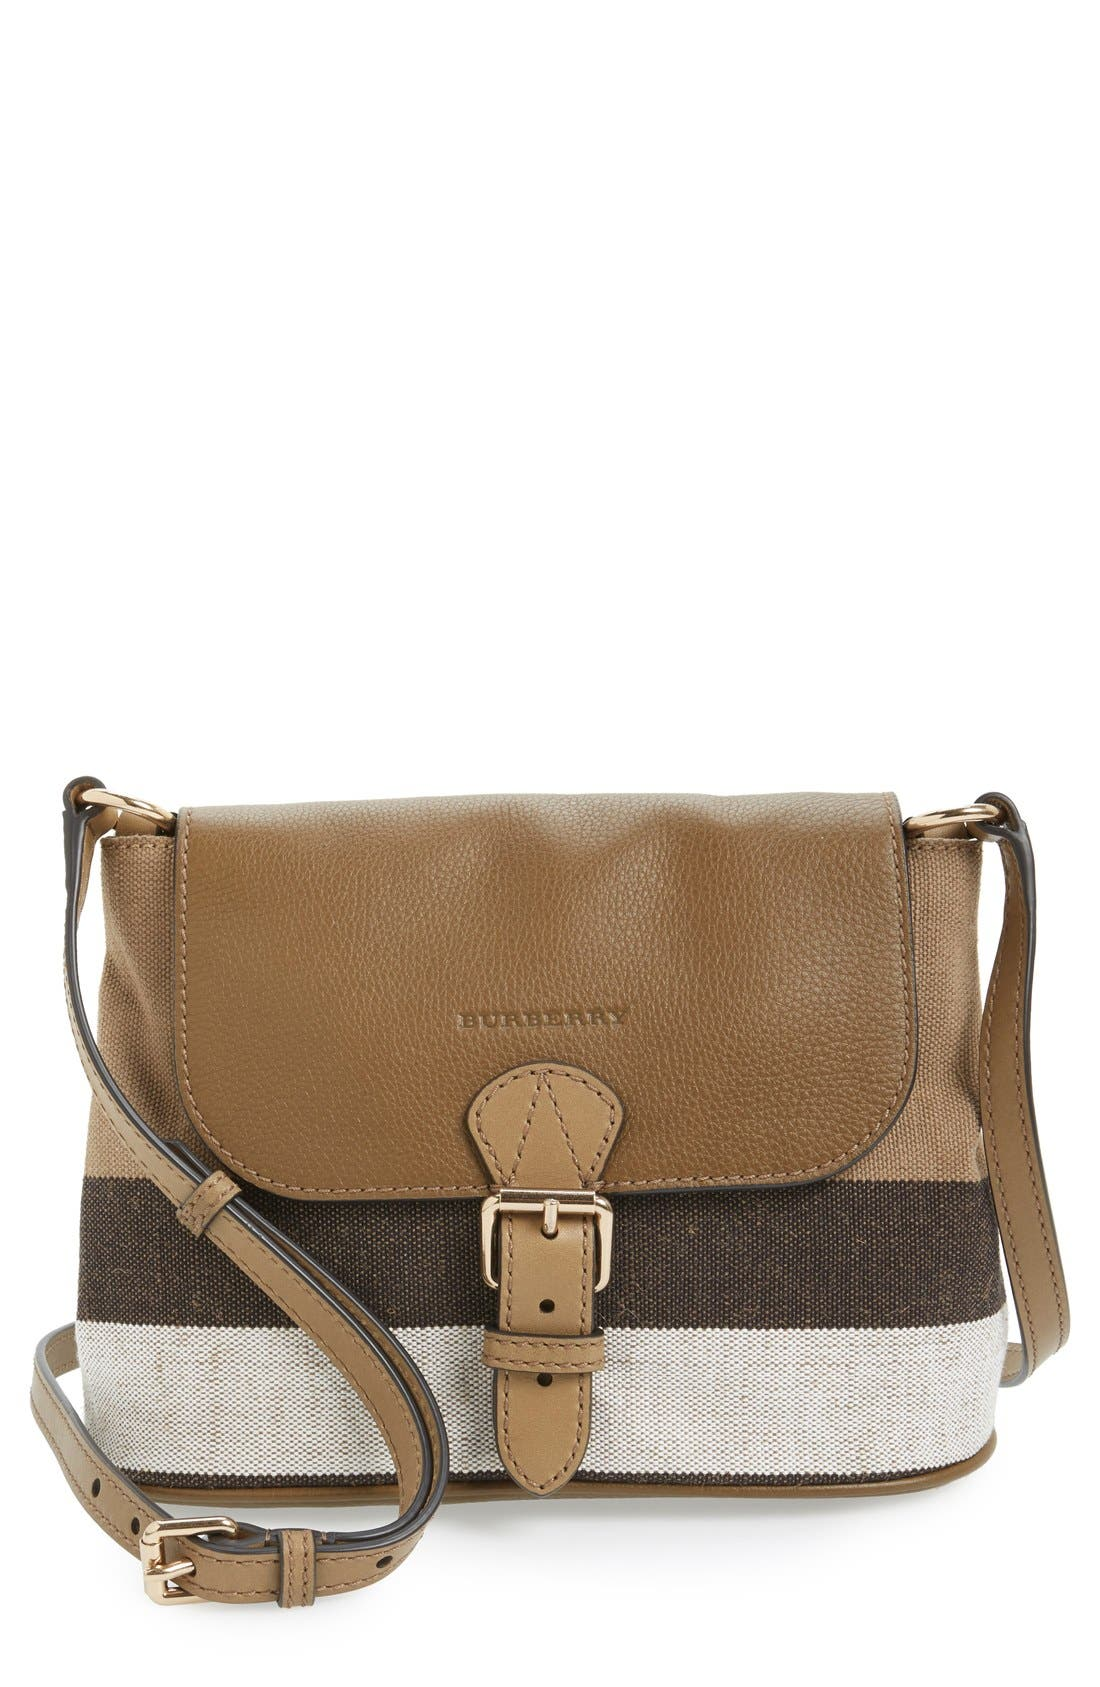 Alternate Image 1 Selected - Burberry 'Small Gowan' Crossbody Bag